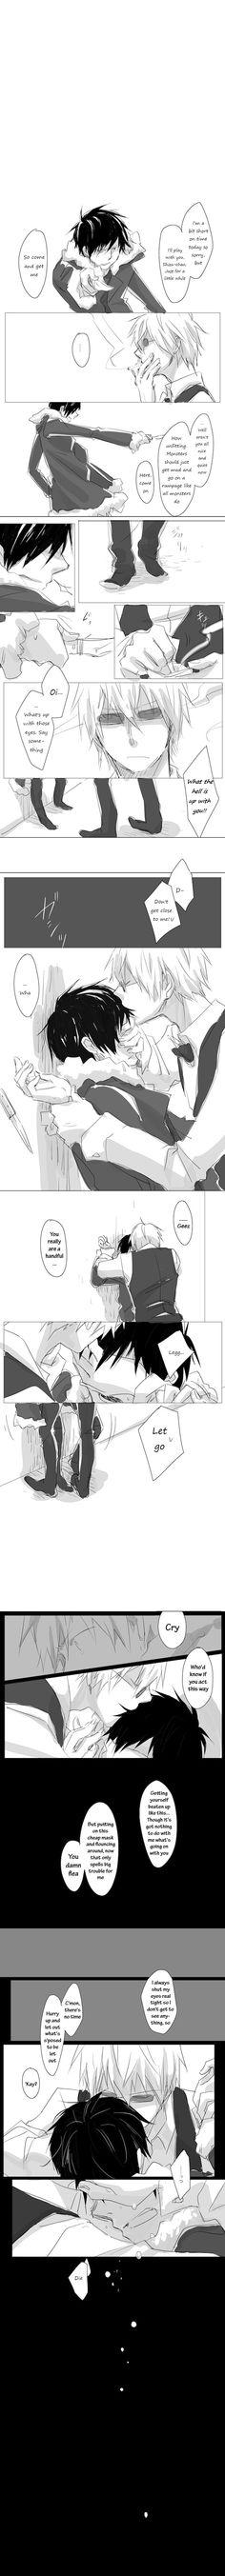 Aww poor Izaya, I'm grateful you gave him a hug Shizu-chan... :P Izaya needs one every now and again.